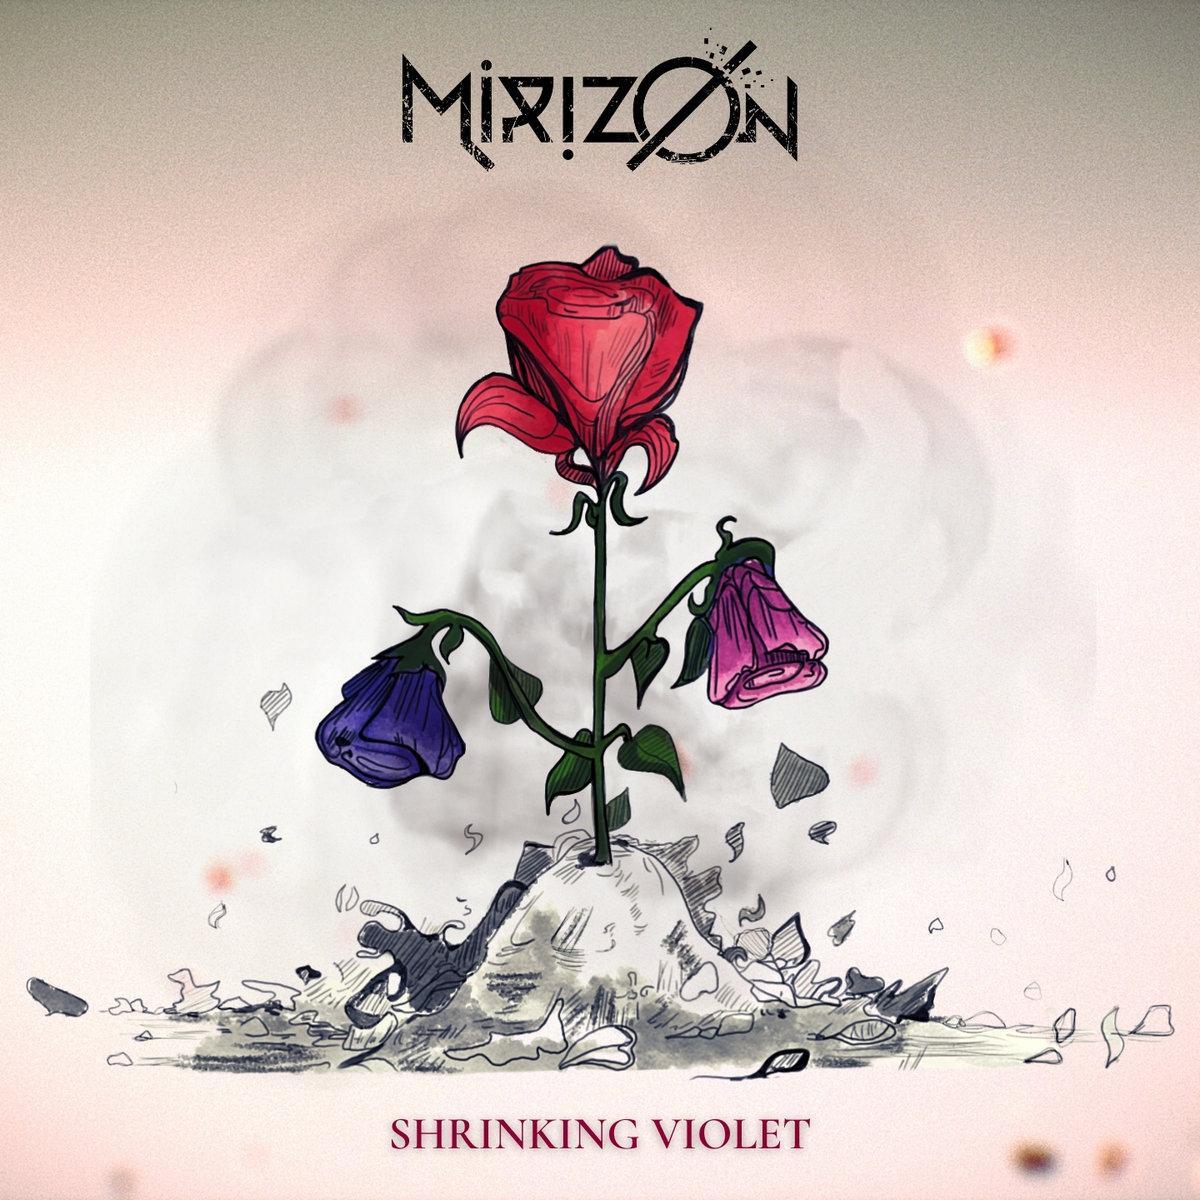 Chronique d'album : Mirizøn